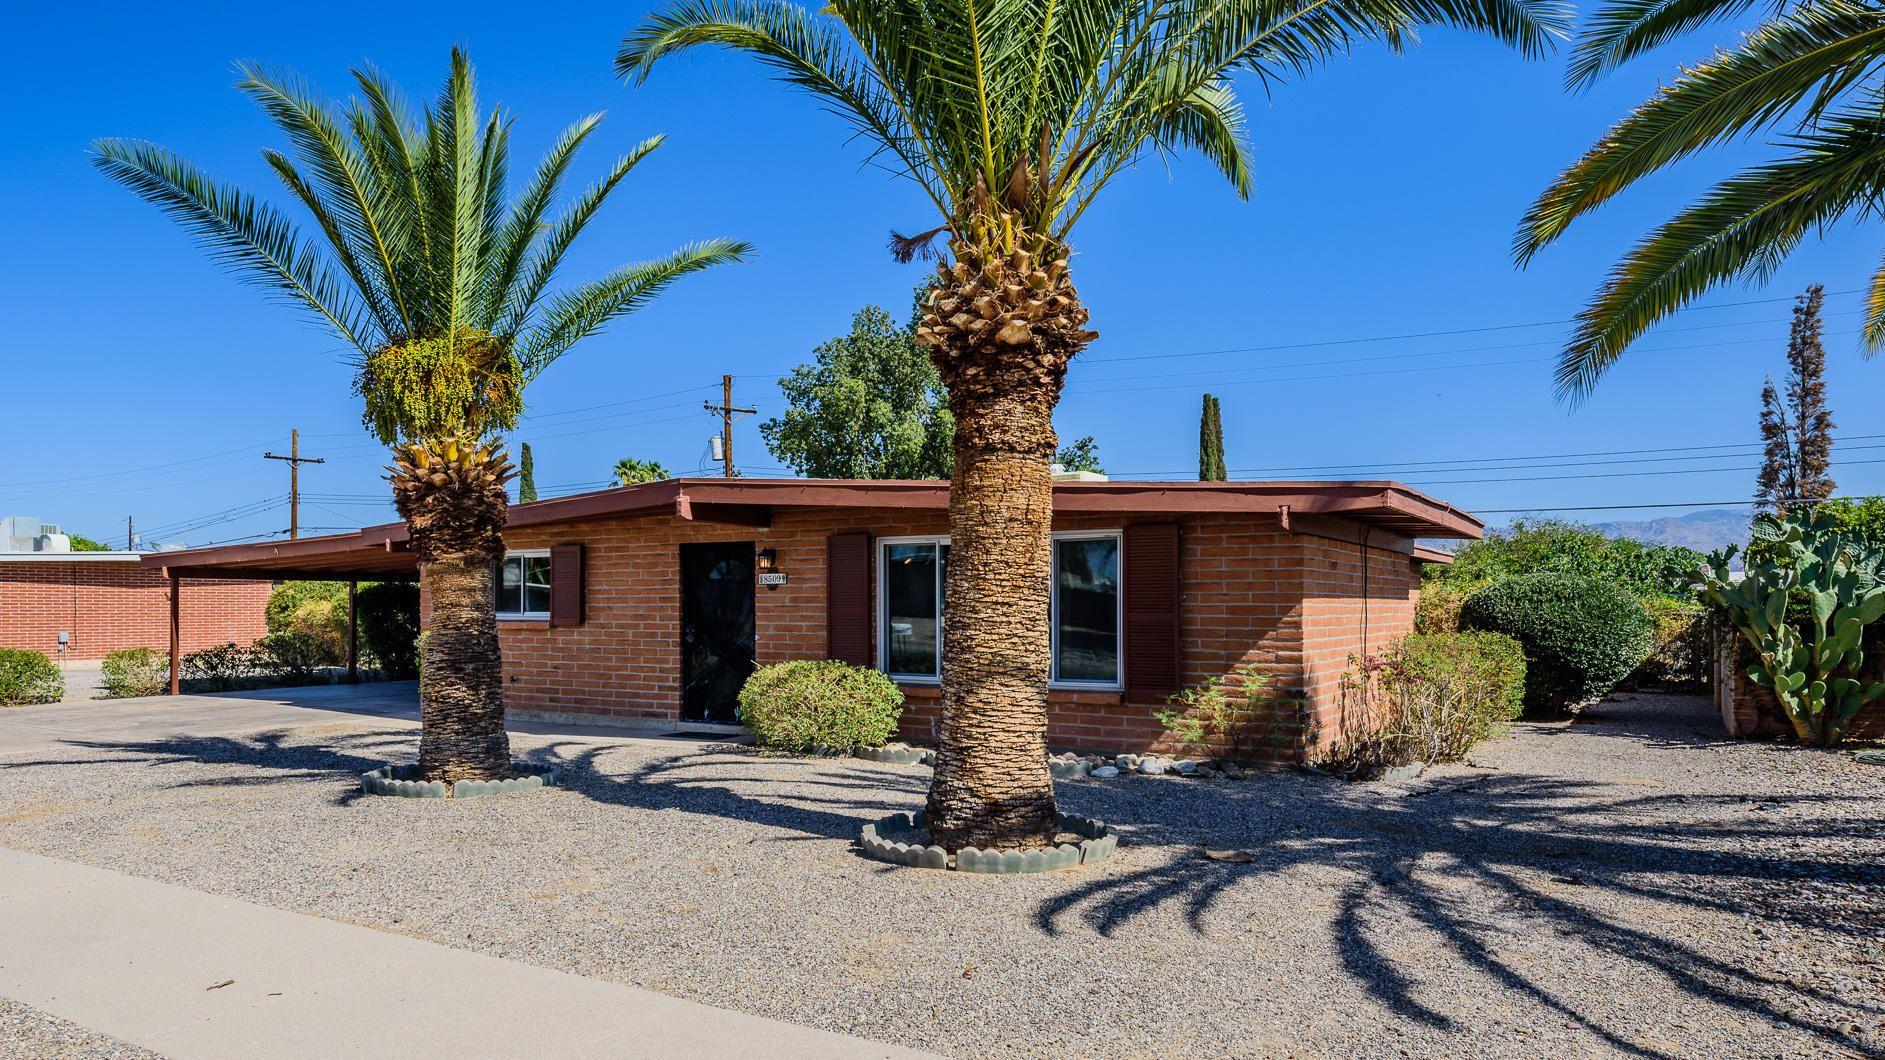 8509 E 19Th Street, Tucson, AZ 85710 - MLS#: 22112515